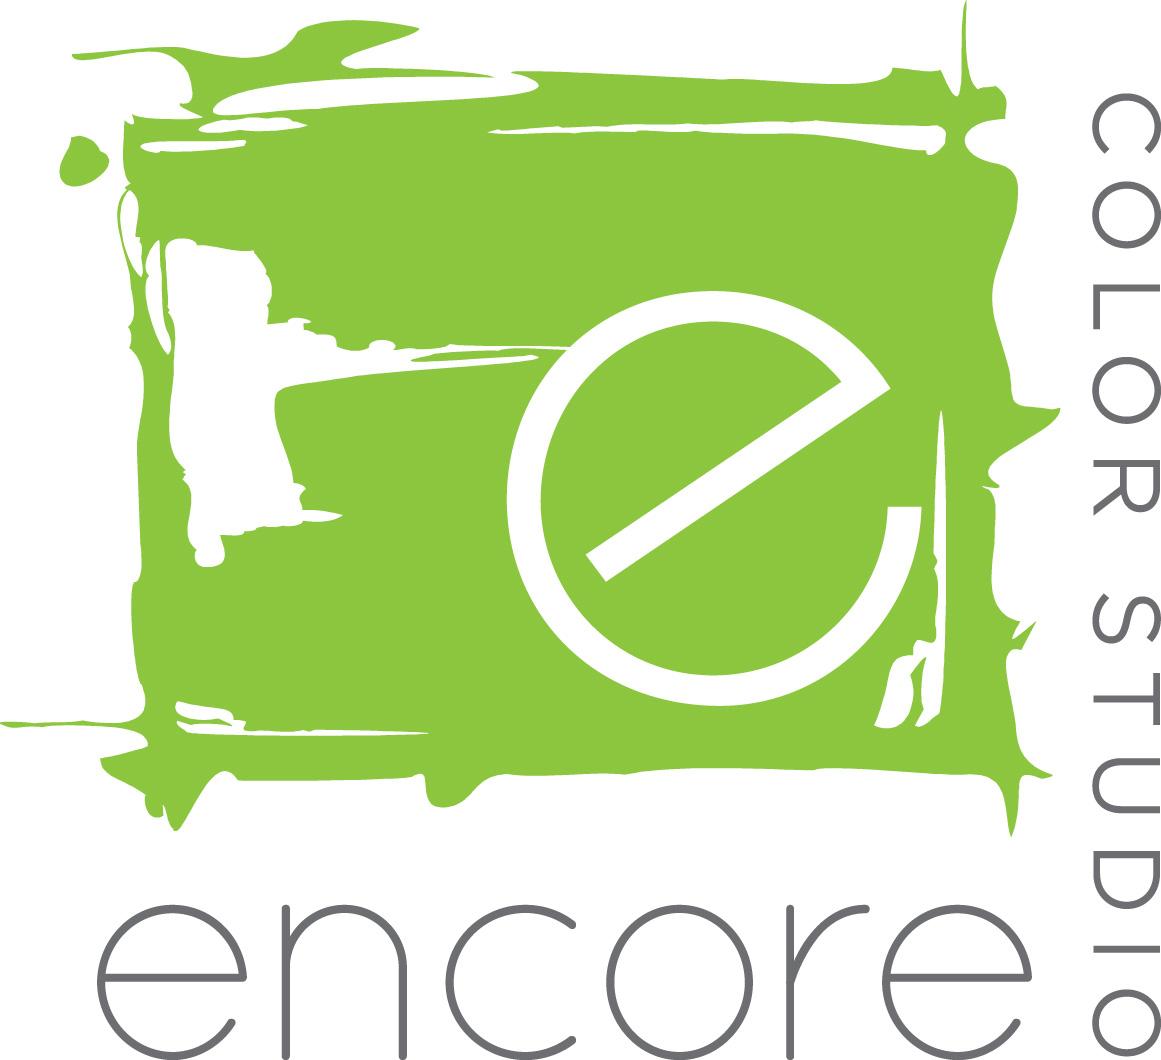 encore logos CMYK - green.jpg